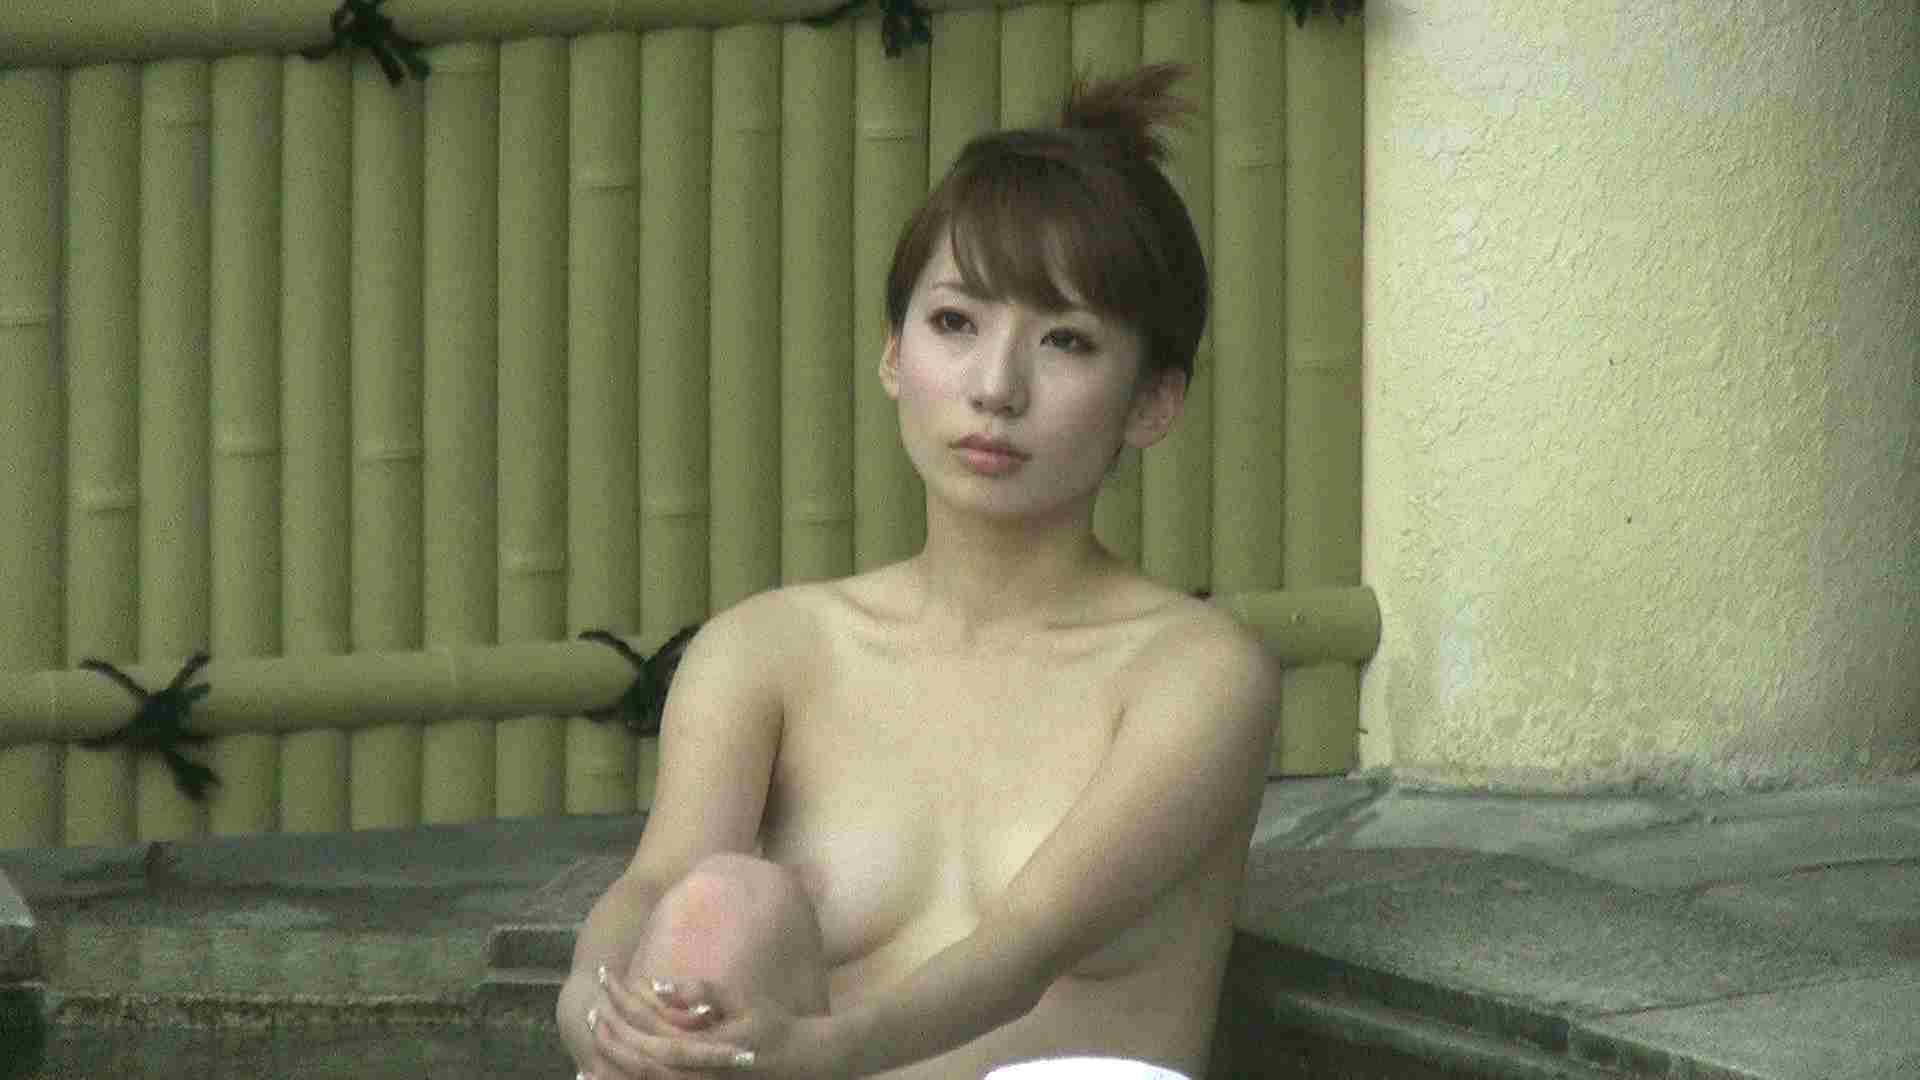 Aquaな露天風呂Vol.208 0  78連発 6